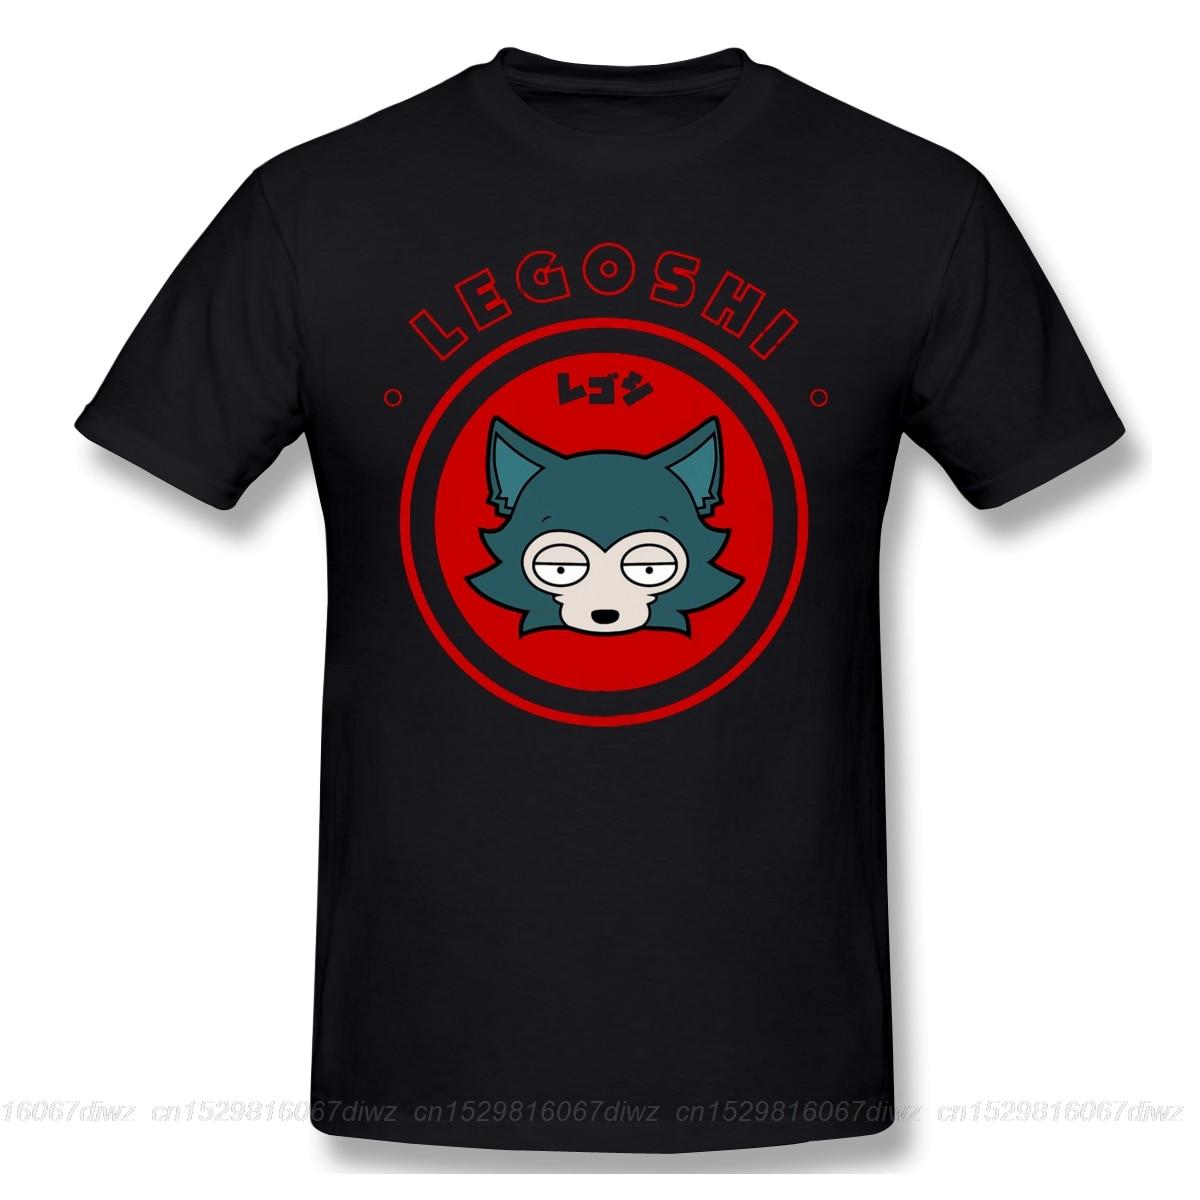 Camiseta Paru Itagaki de anime, camiseta roja, 6xl, bonita camiseta gráfica, CHIBI LEGOSHI Beasts, Manga corta a la moda para hombres